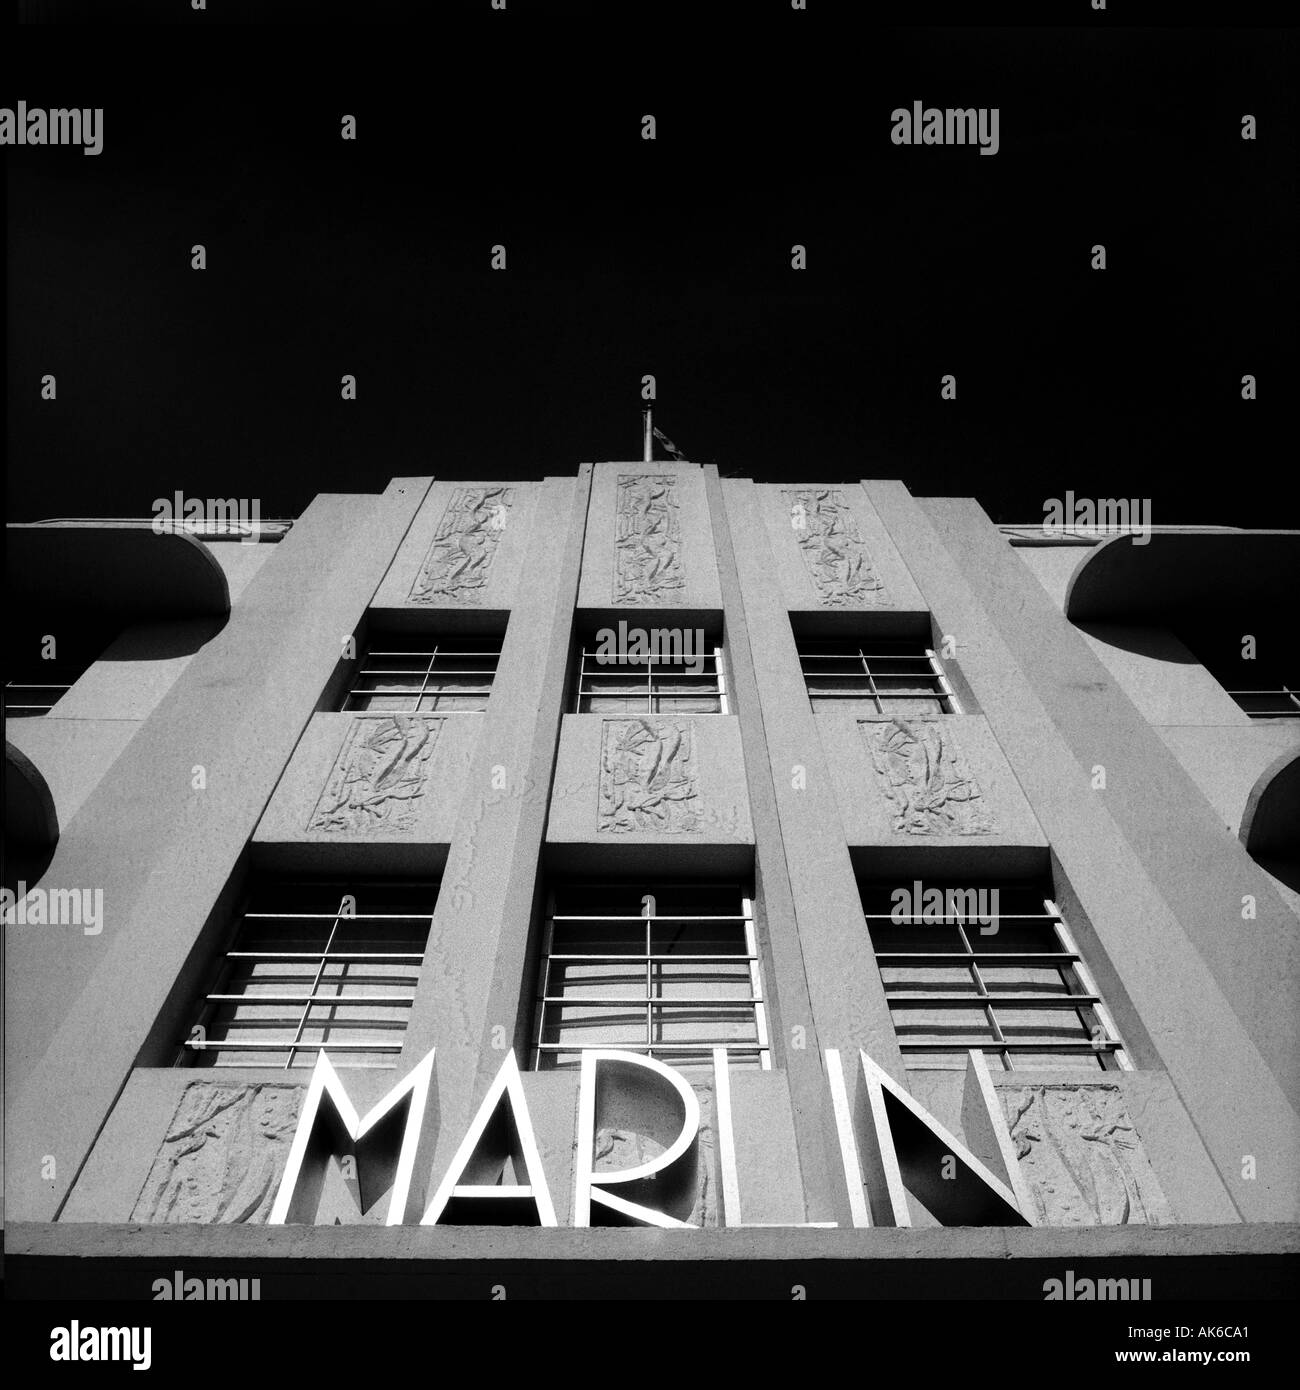 Façade de l'hôtel Marlin à Miami s quartier Art déco de South Beach Photo Stock